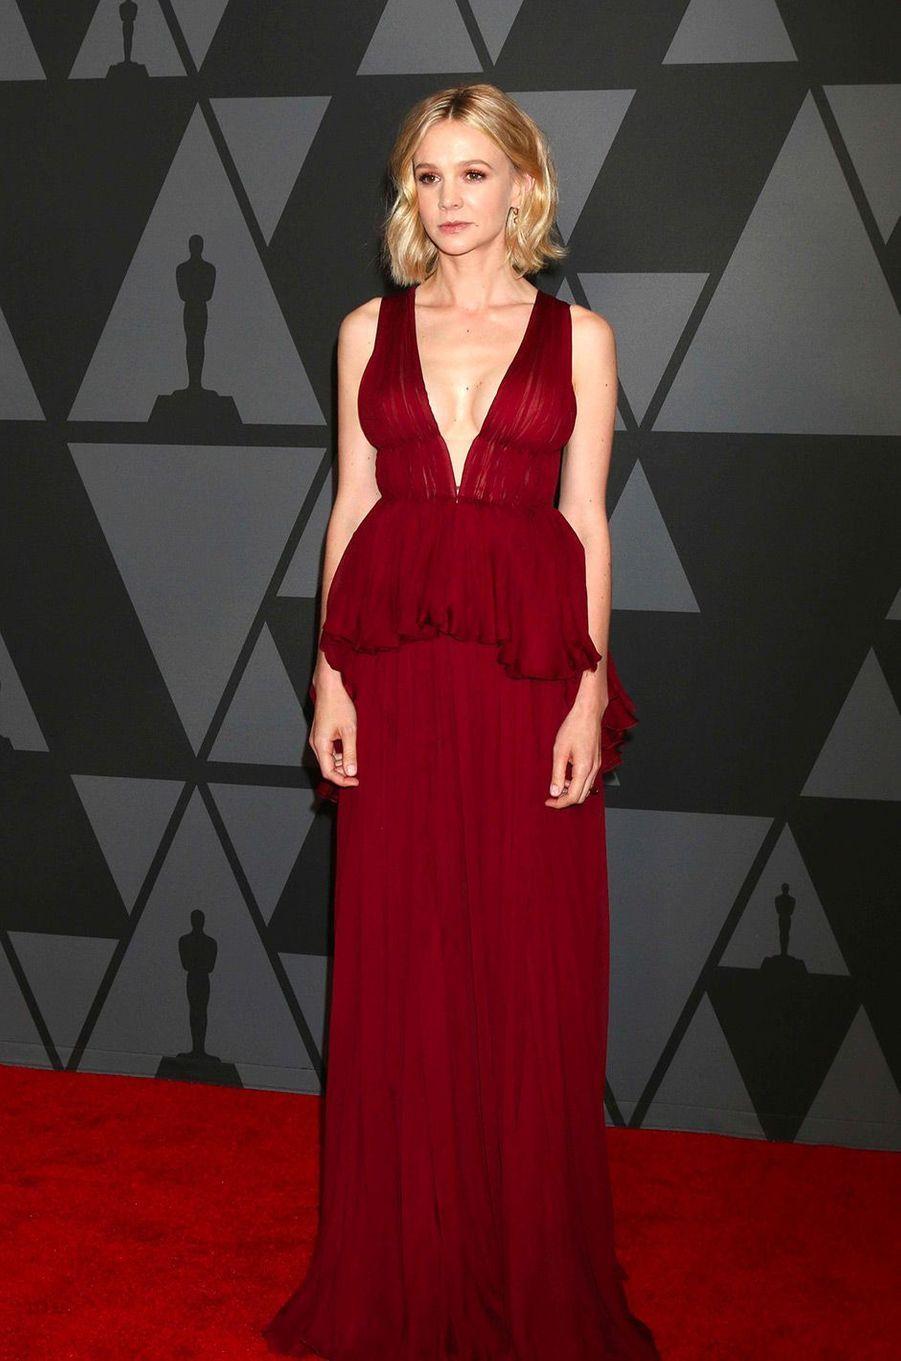 Carey Mulligan aux Governors Awards à Los Angeles, samedi 11 novembre